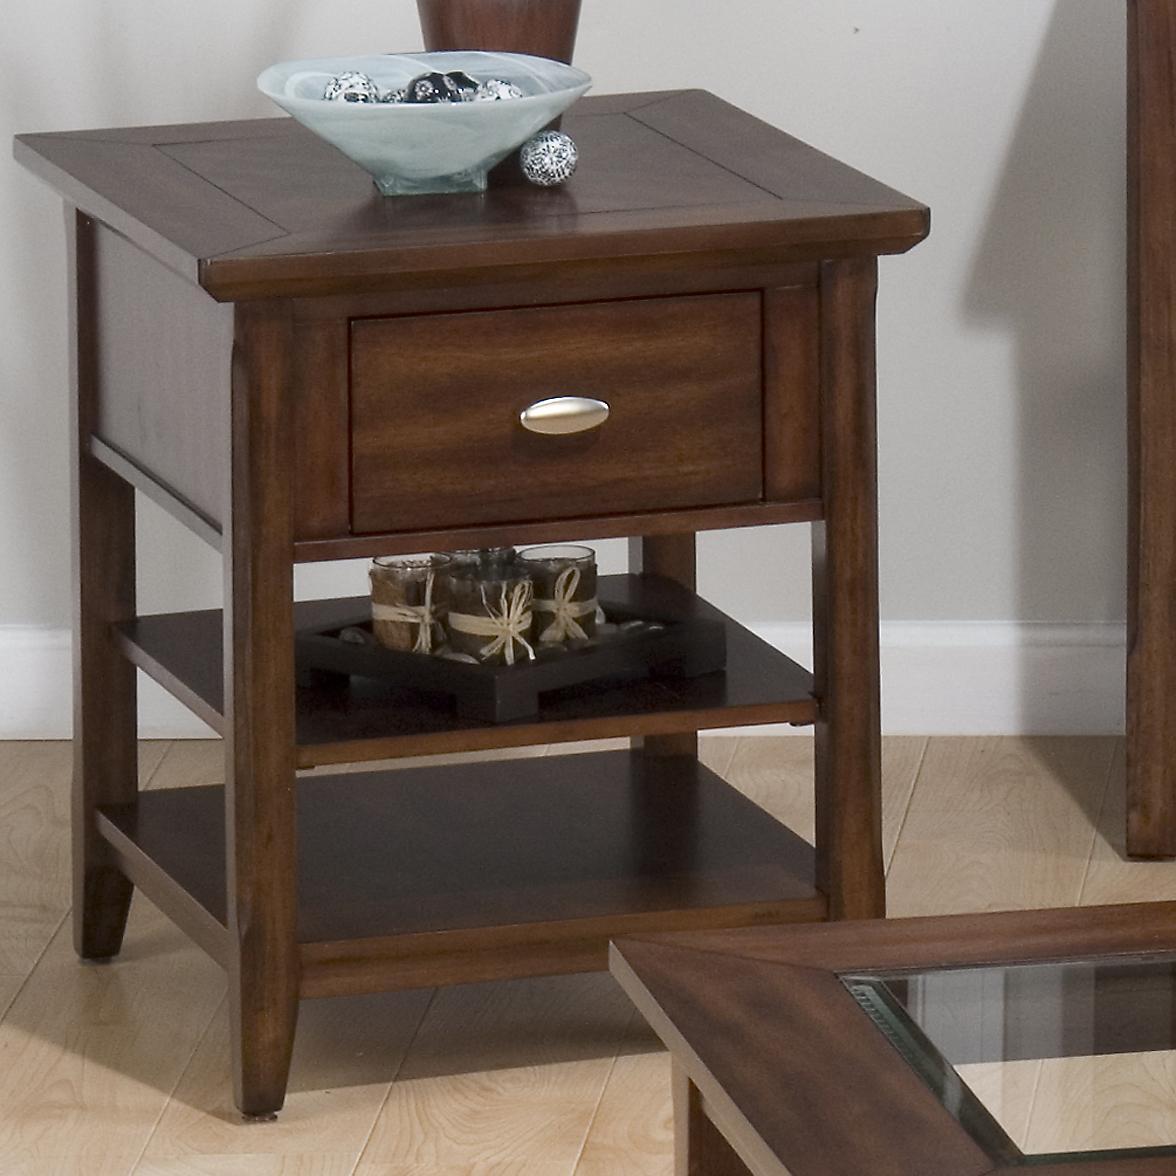 Bellingham Brown End Table w/ Drawer & 2 Shelves by Jofran at Pilgrim Furniture City